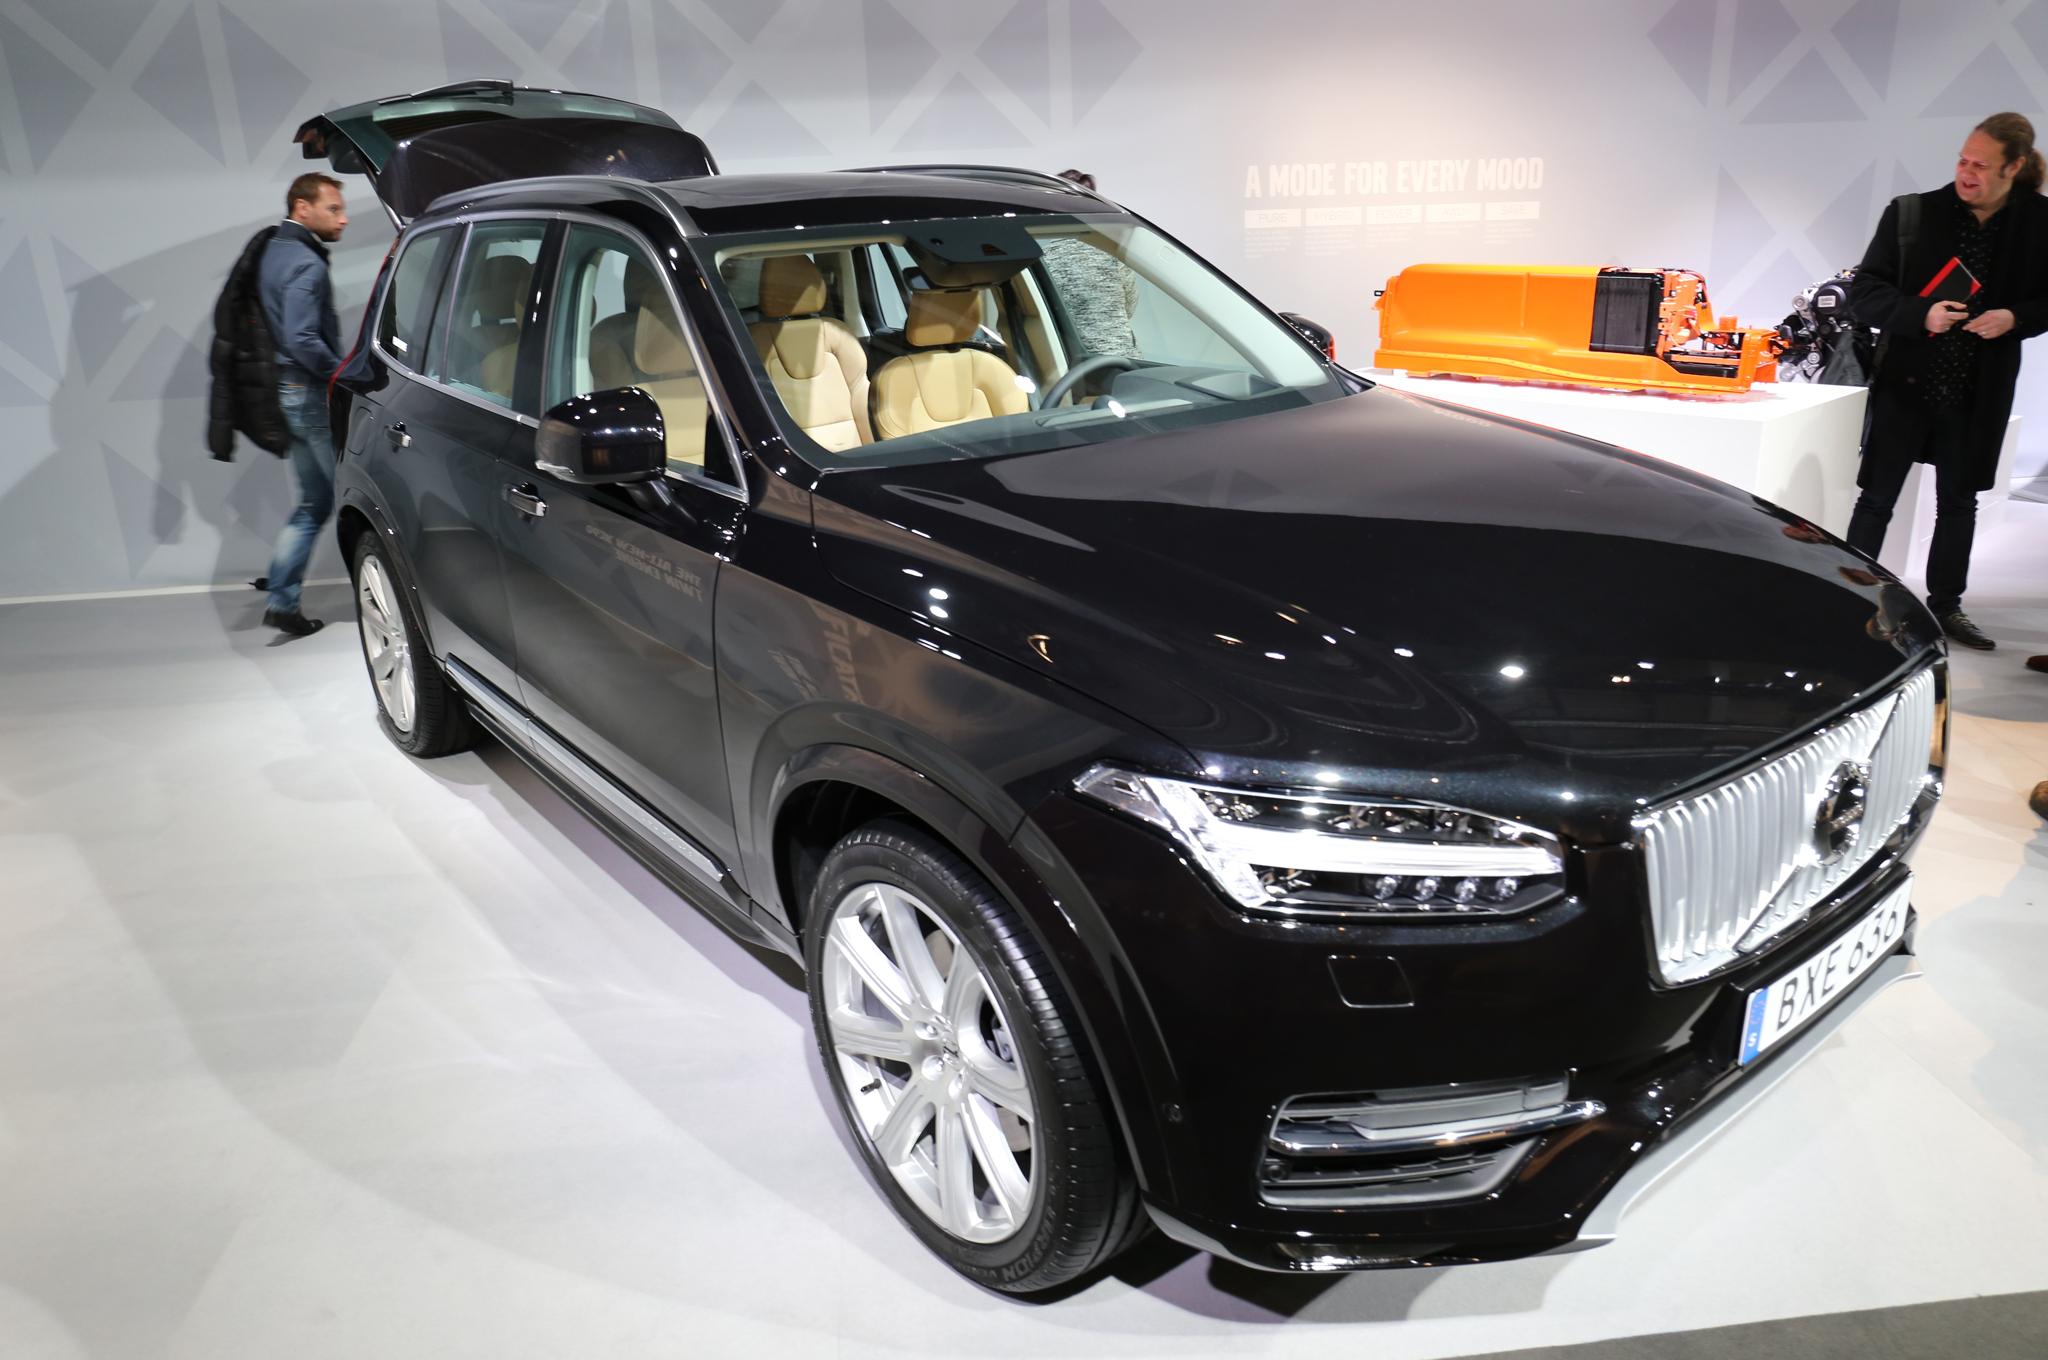 2016 Volvo XC90 T8 Auto Show Preview